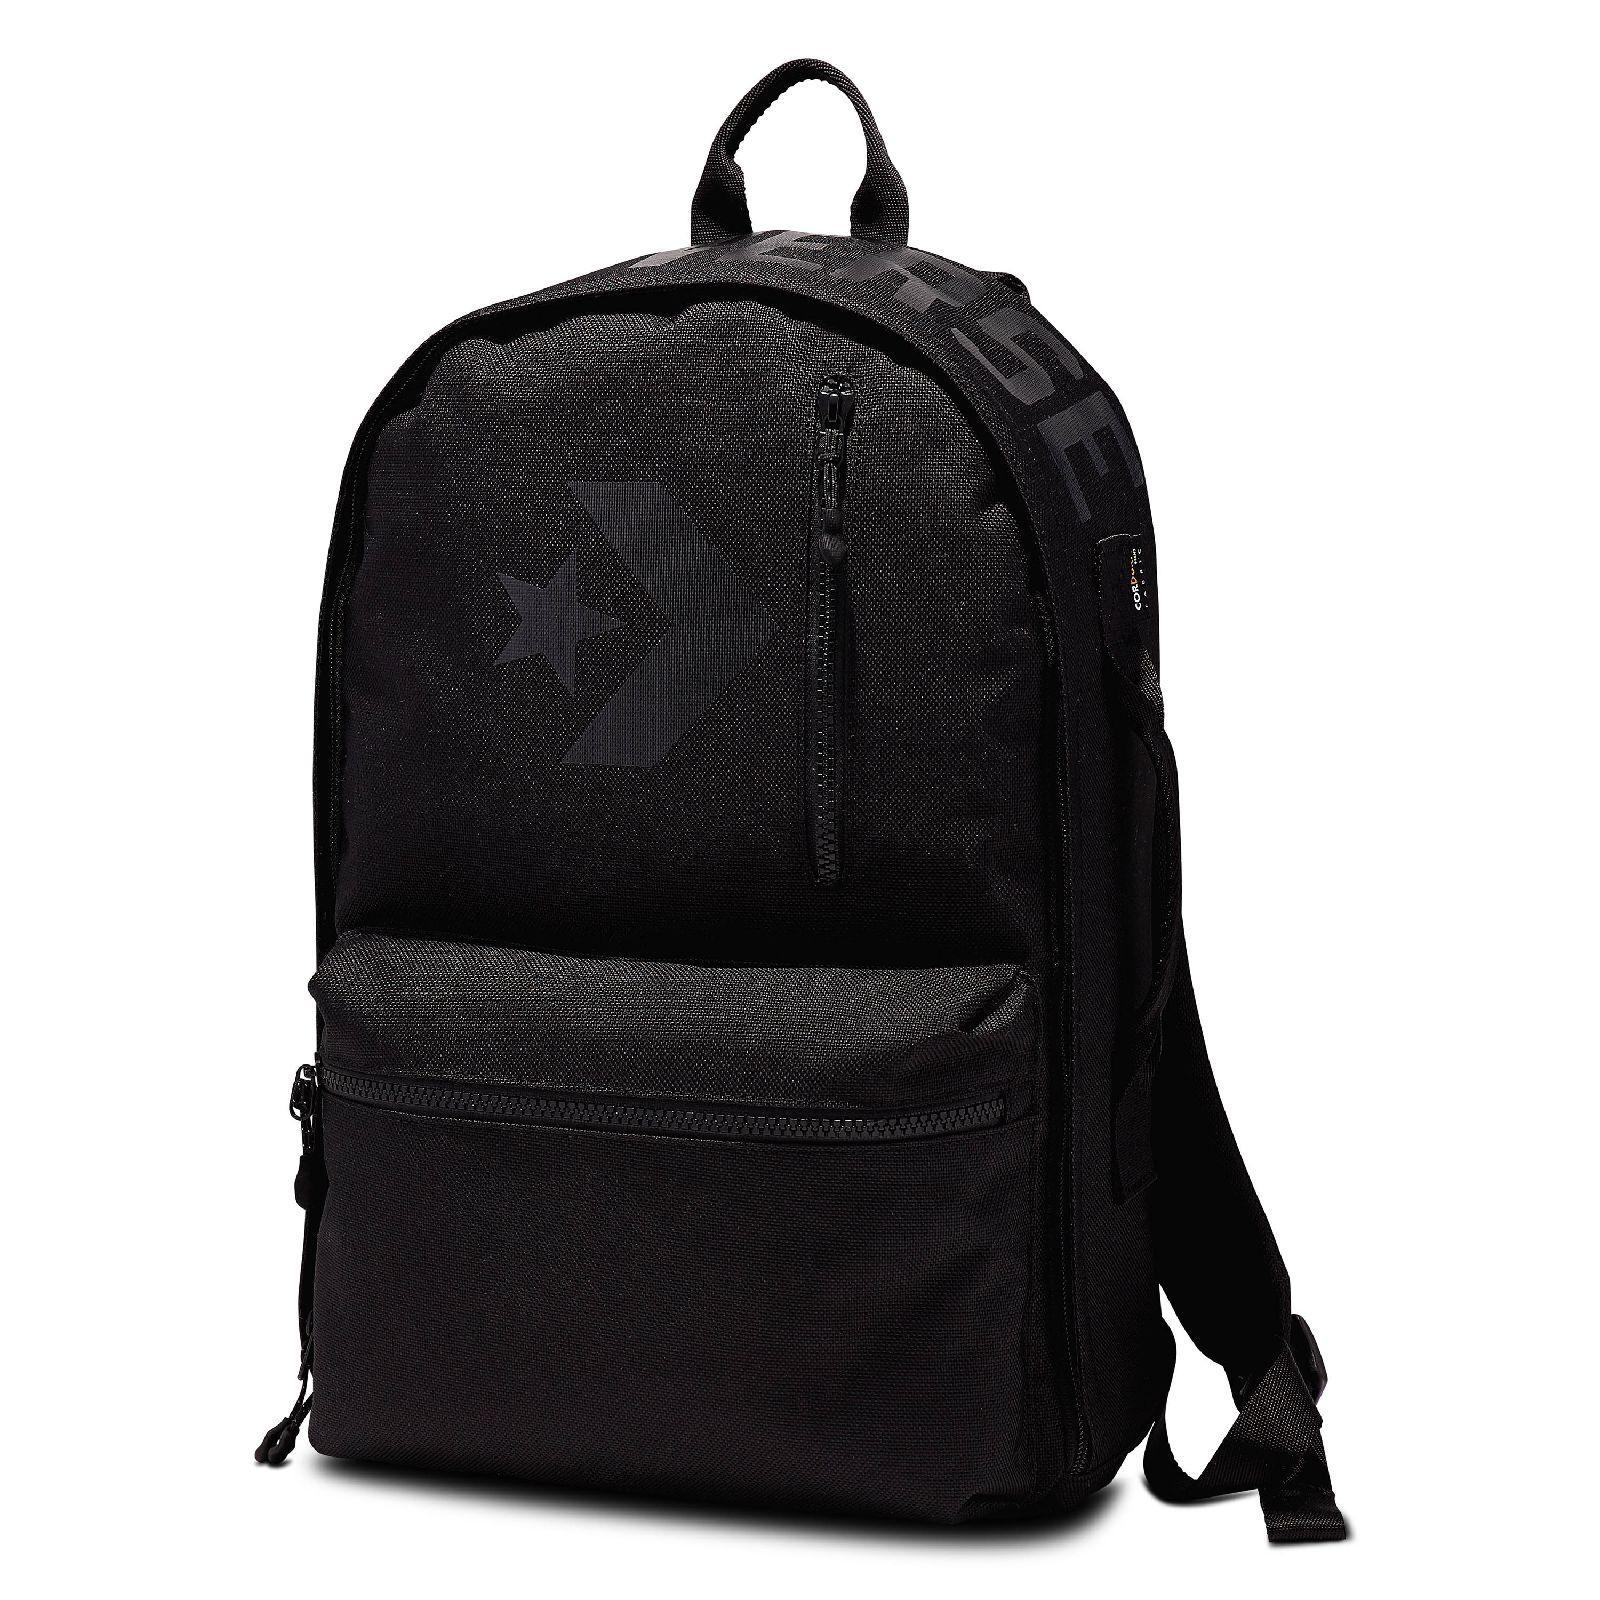 Unisex Backpacks for sale - Unisex Travel Backpacks online brands ... bef040736c203